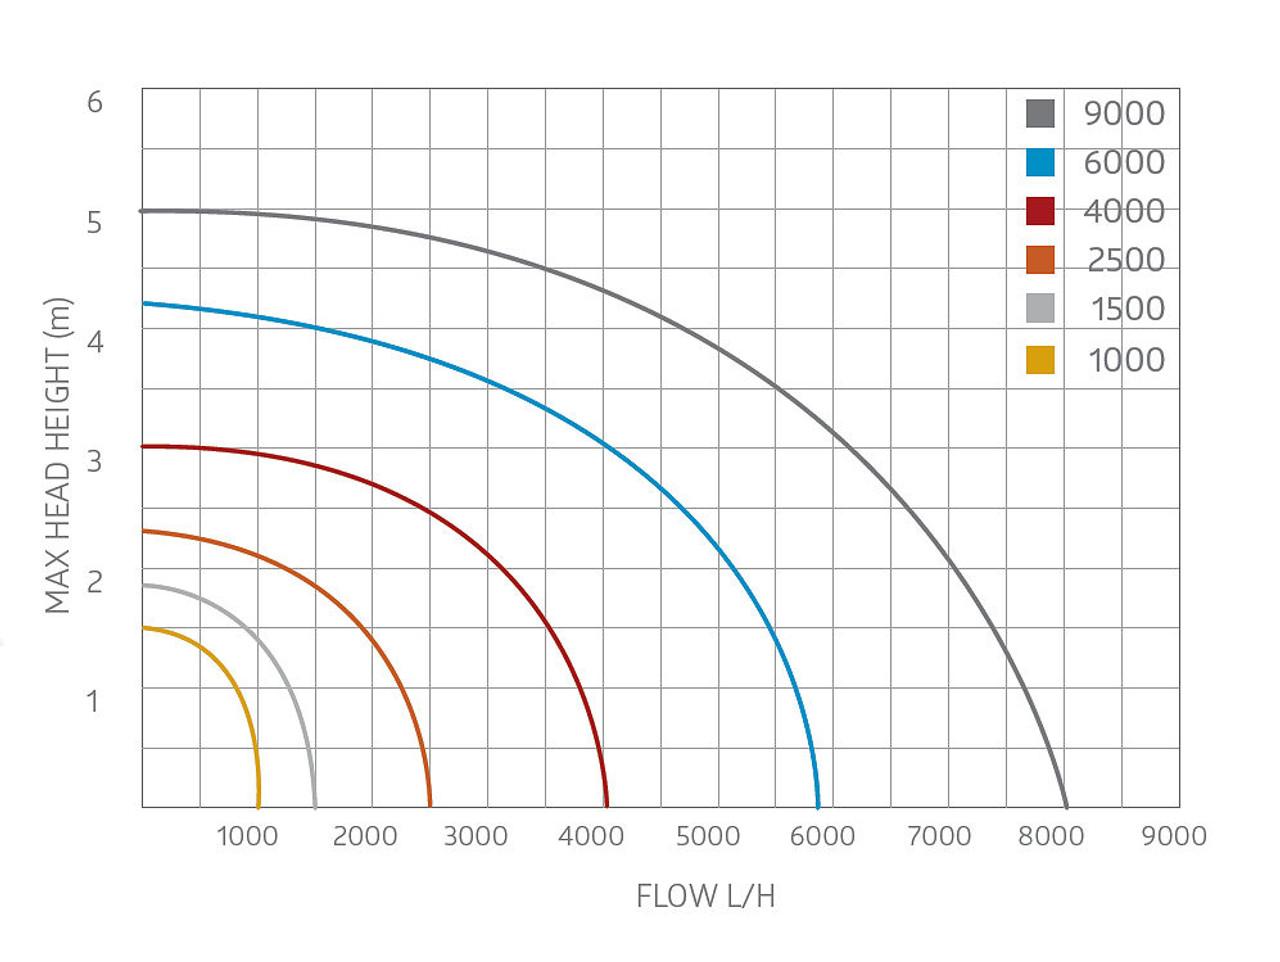 Aquagarden Mako 2500 Performance Curve